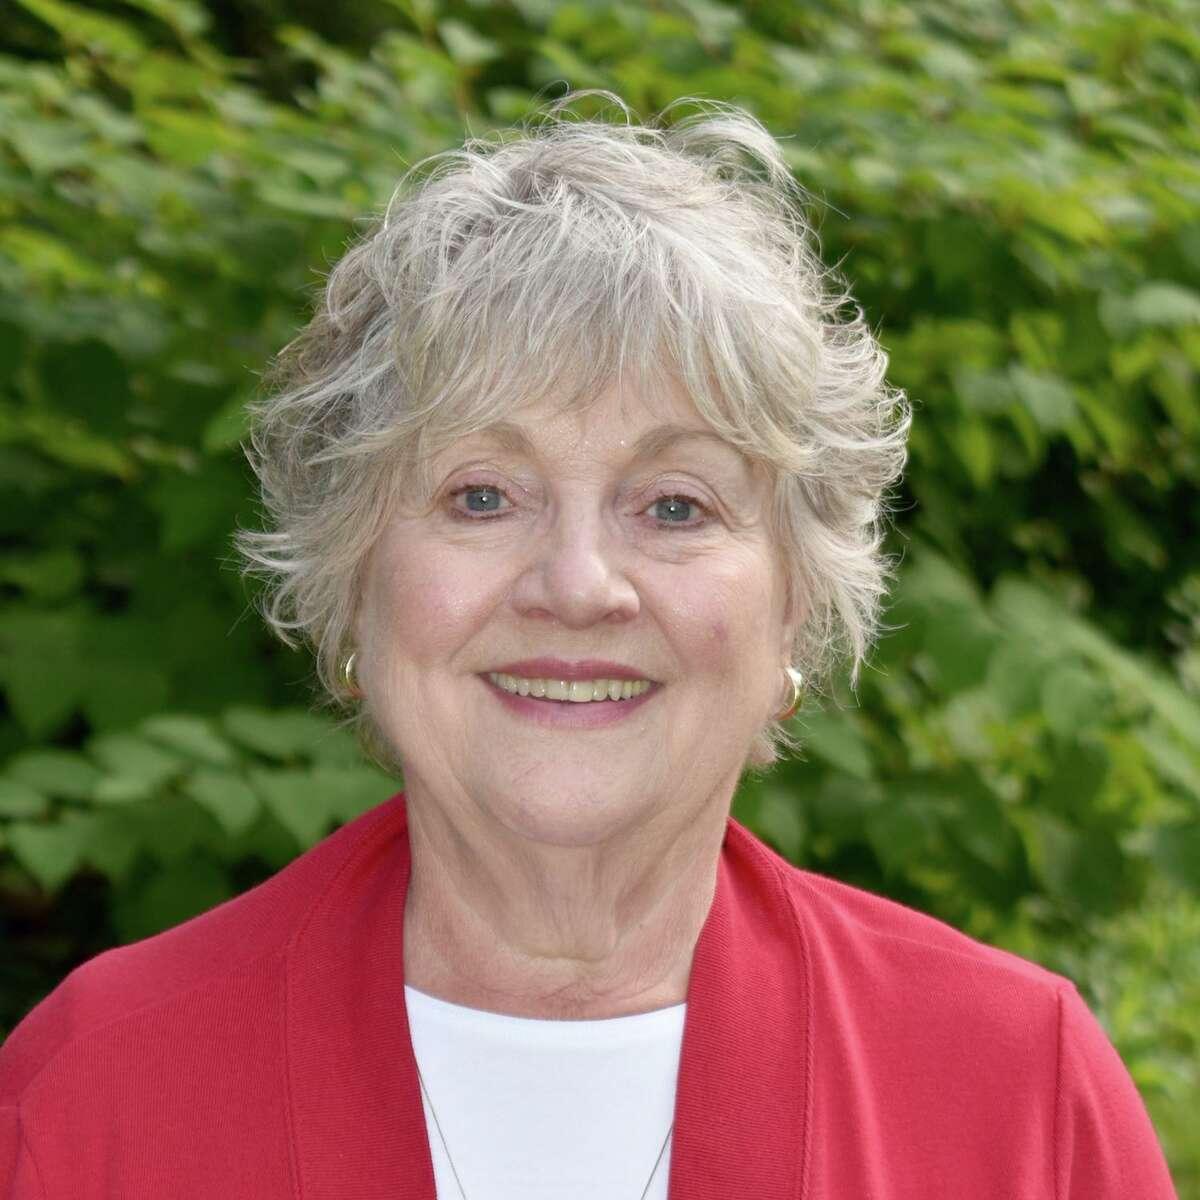 Winsted Town Clerk Sheila Sedlak.